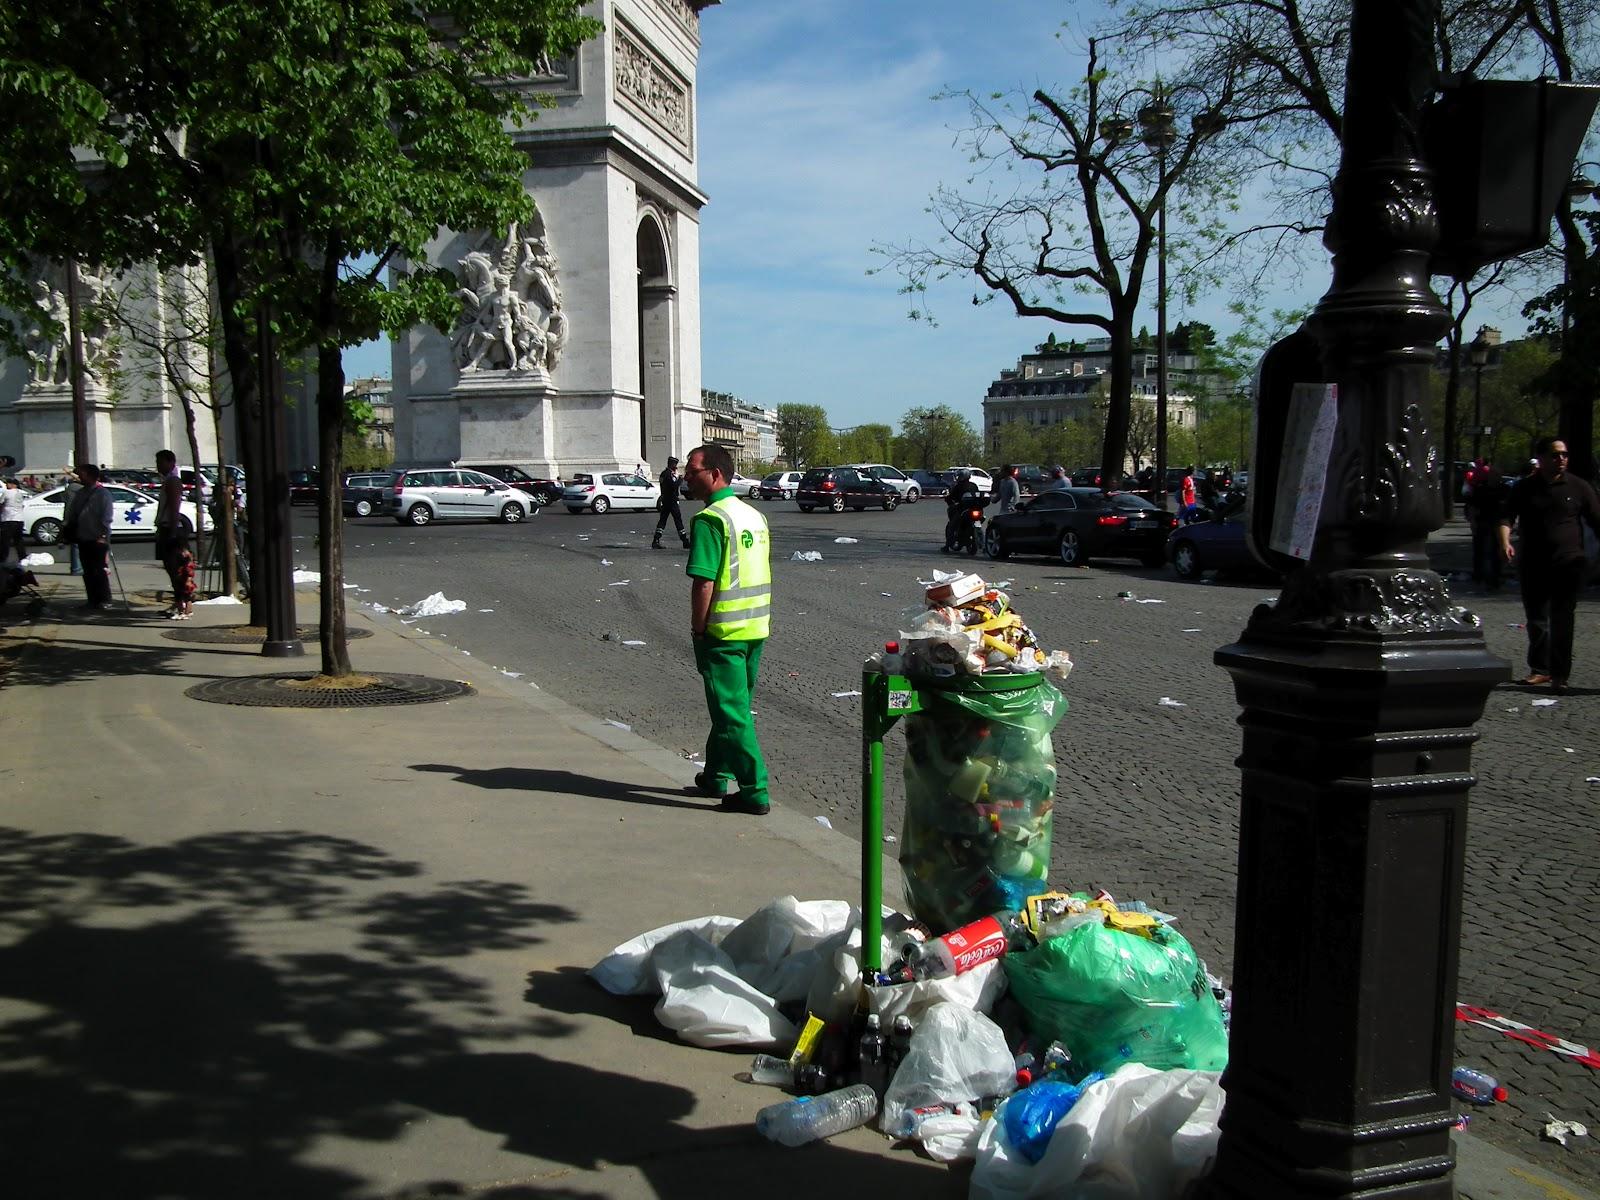 Imagini pentru Parigi e sporca foto